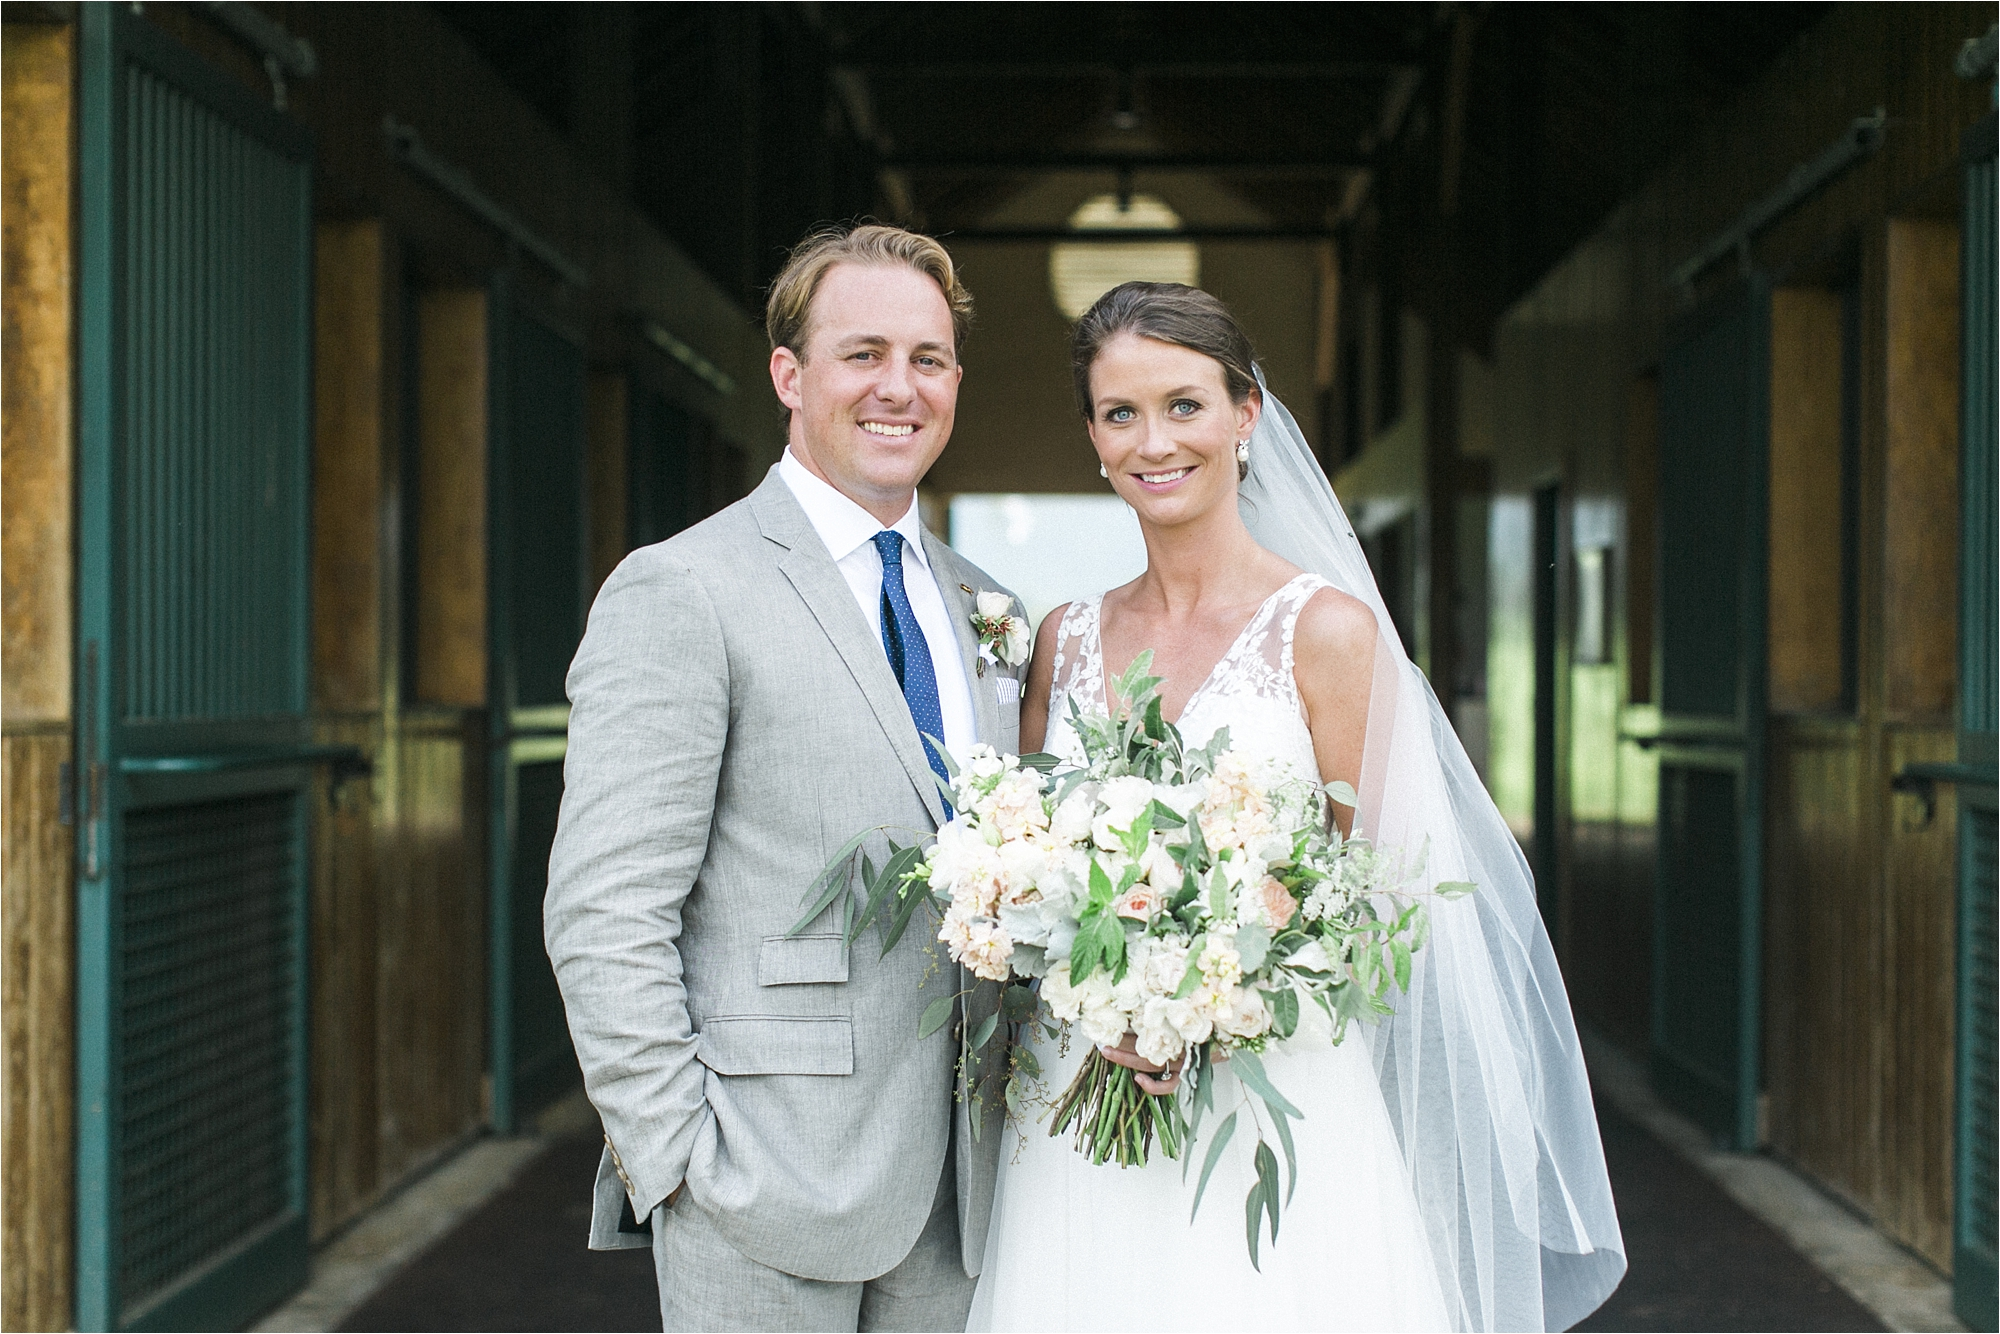 stephanie-yonce-charlottesville-virginia-king-family-vineyard-wedding-photos_0015.jpg